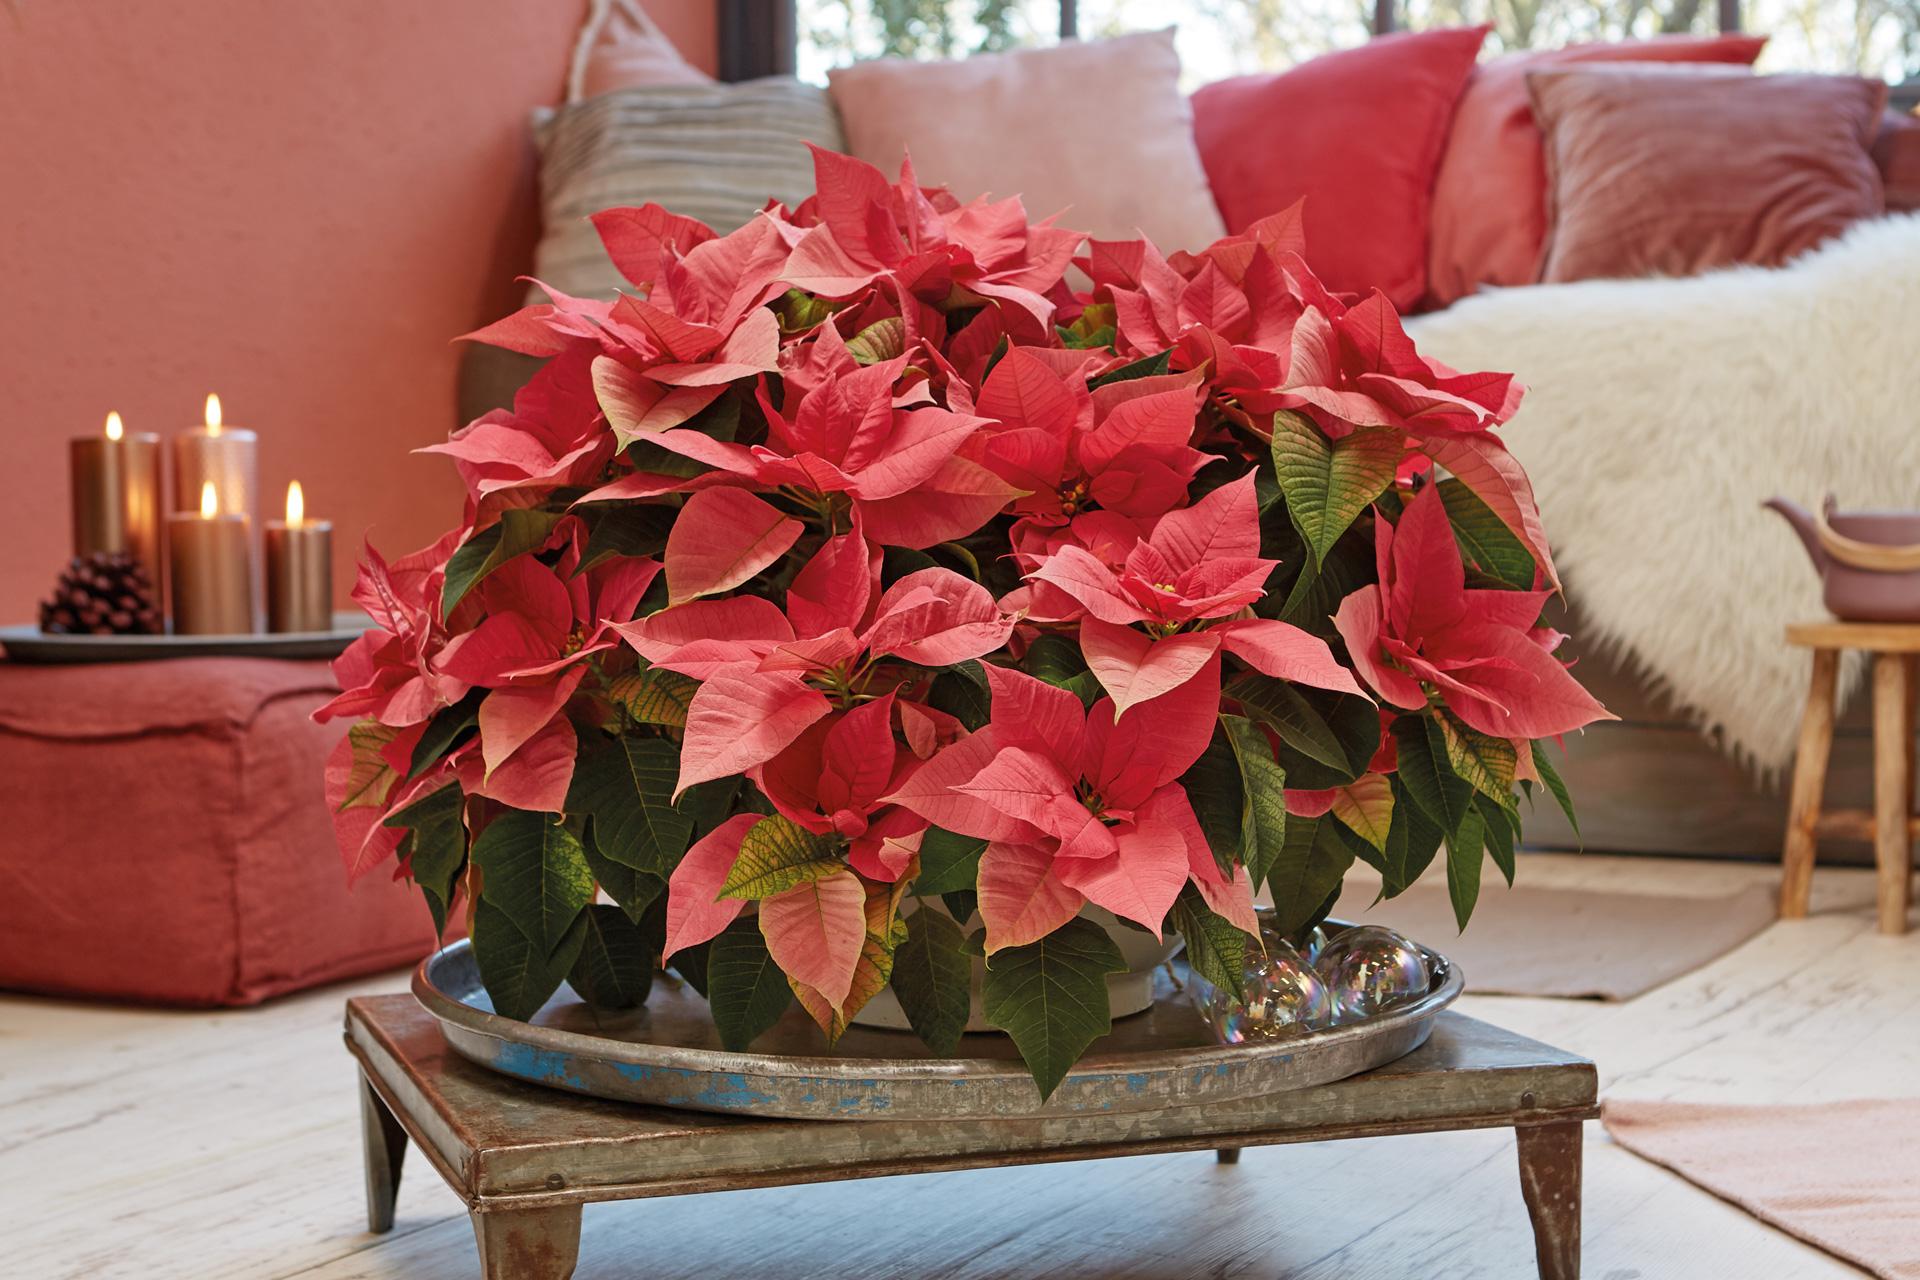 Wunderschöne Poinsettien Weihnachtssterne in Rot by Stars for Europe